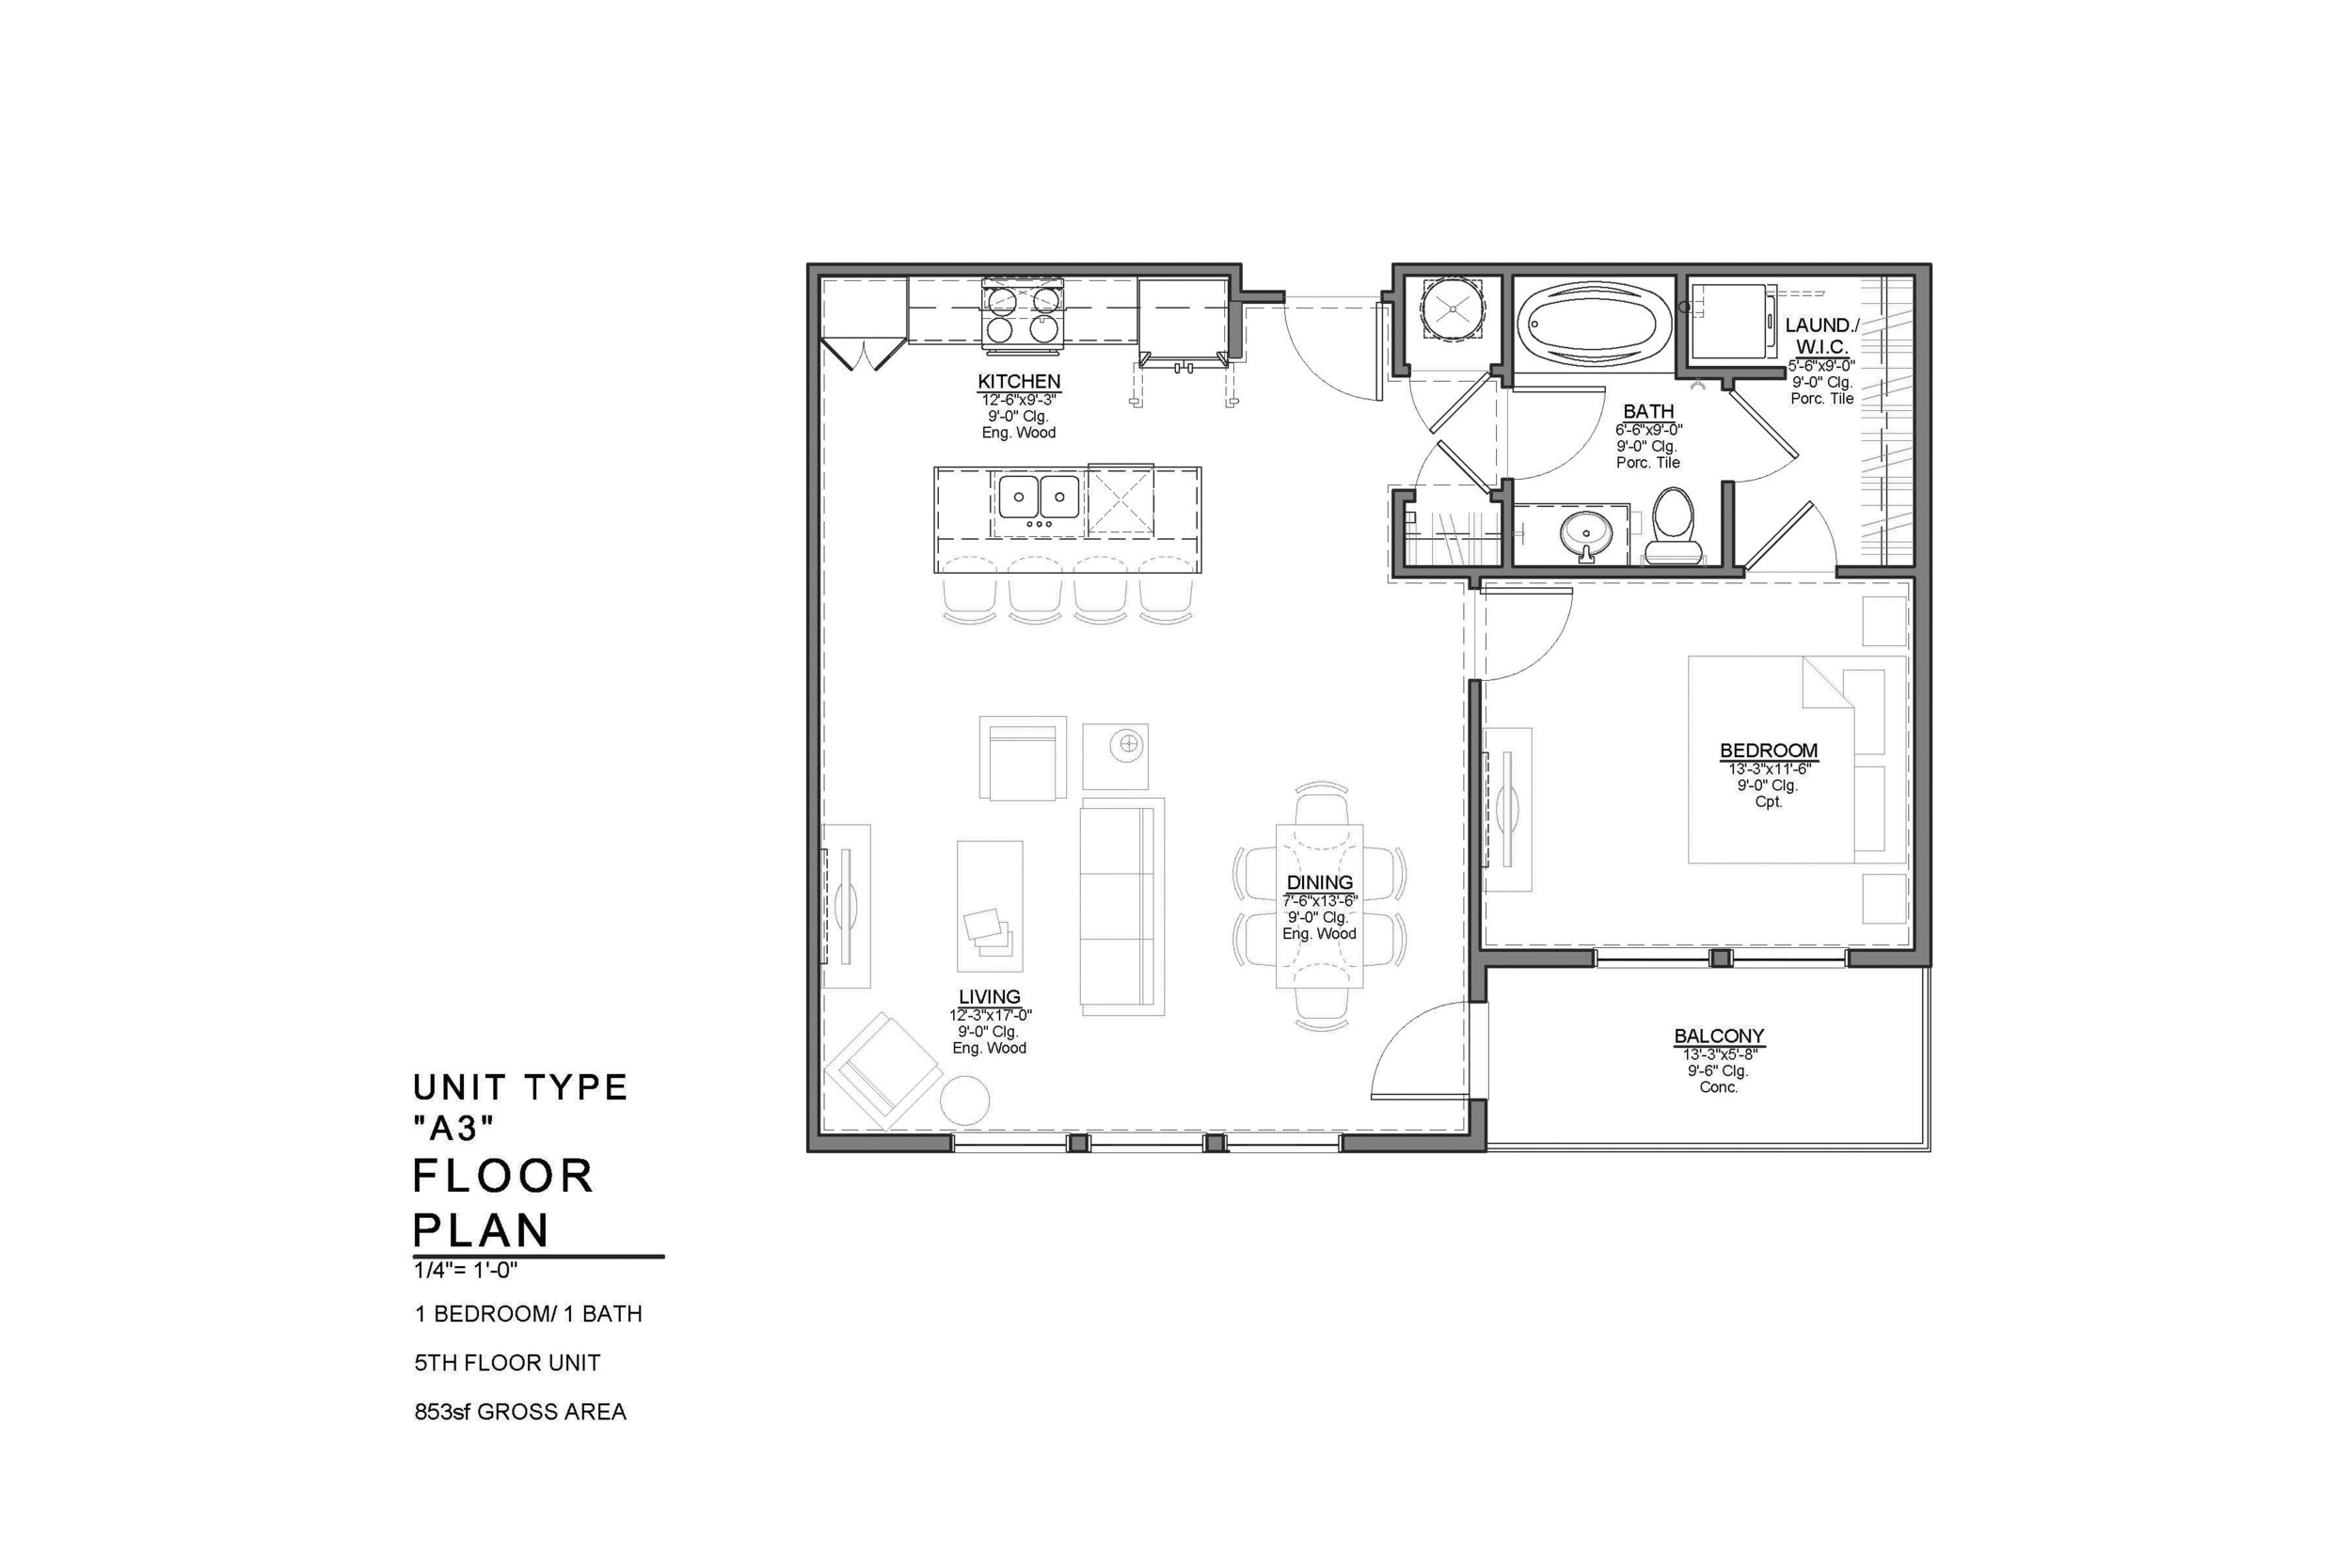 A3 FLOOR PLAN: 1 BEDROOM / 1 BATH